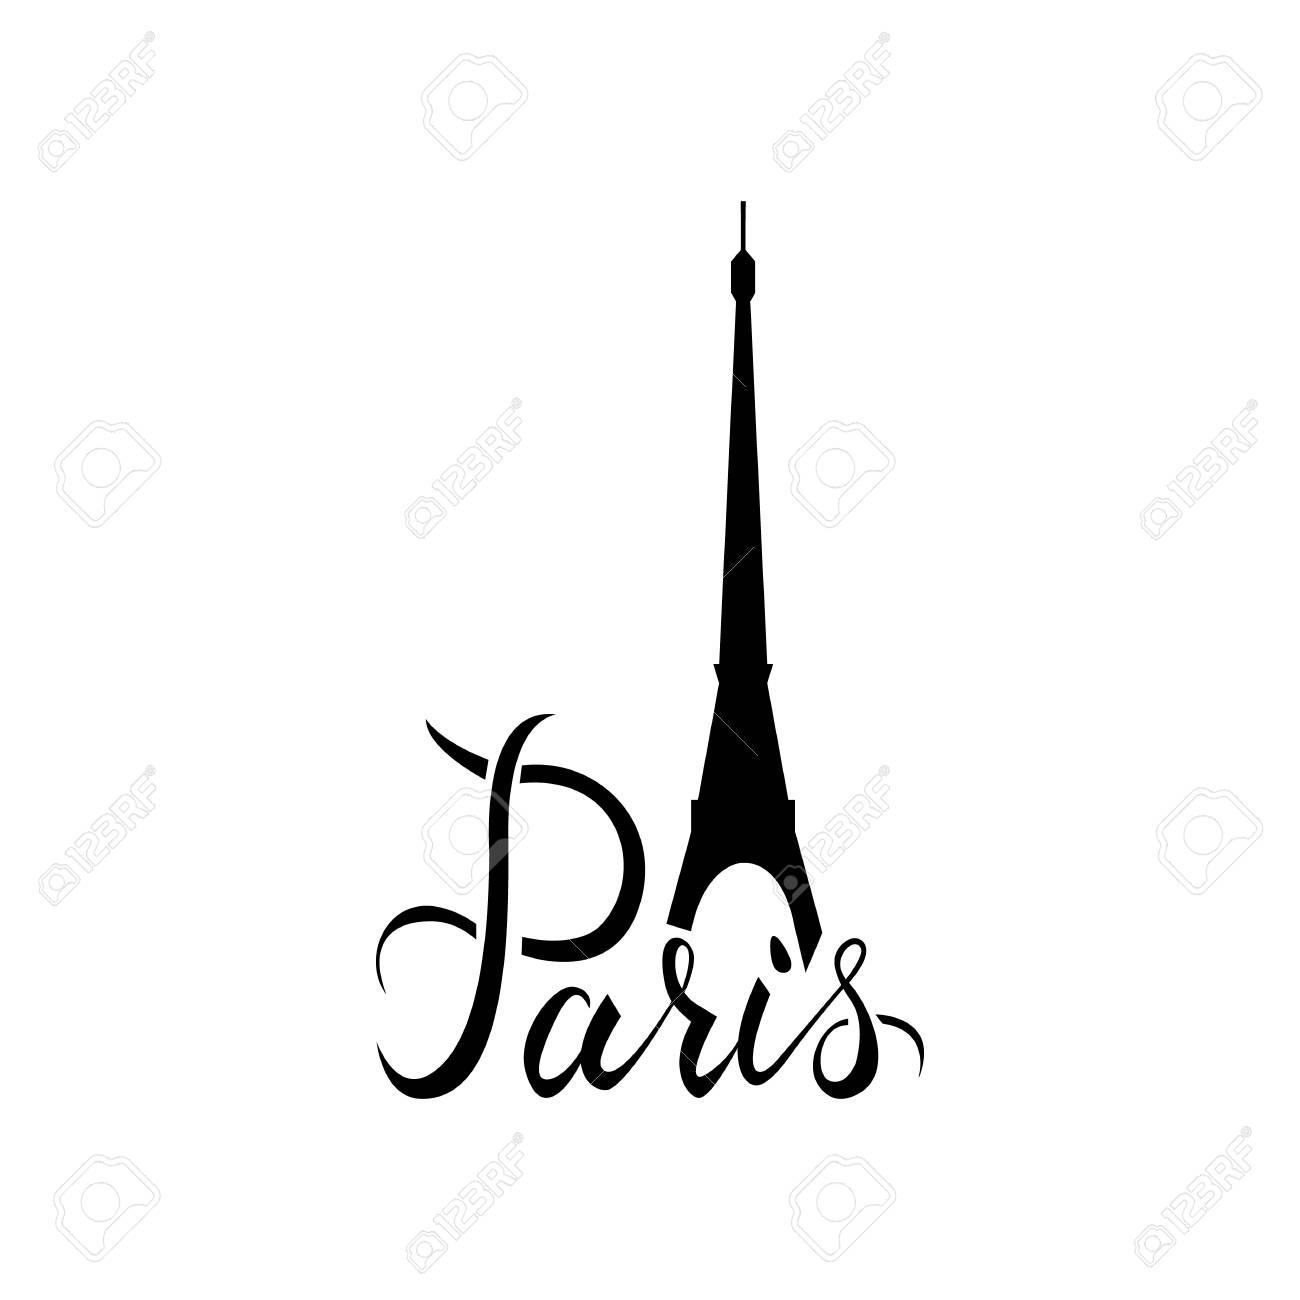 Palabra De París Con La Torre Eiffel París Letras De Tinta A Mano Caligrafía Moderna Del Cepillo Frase Manuscrita